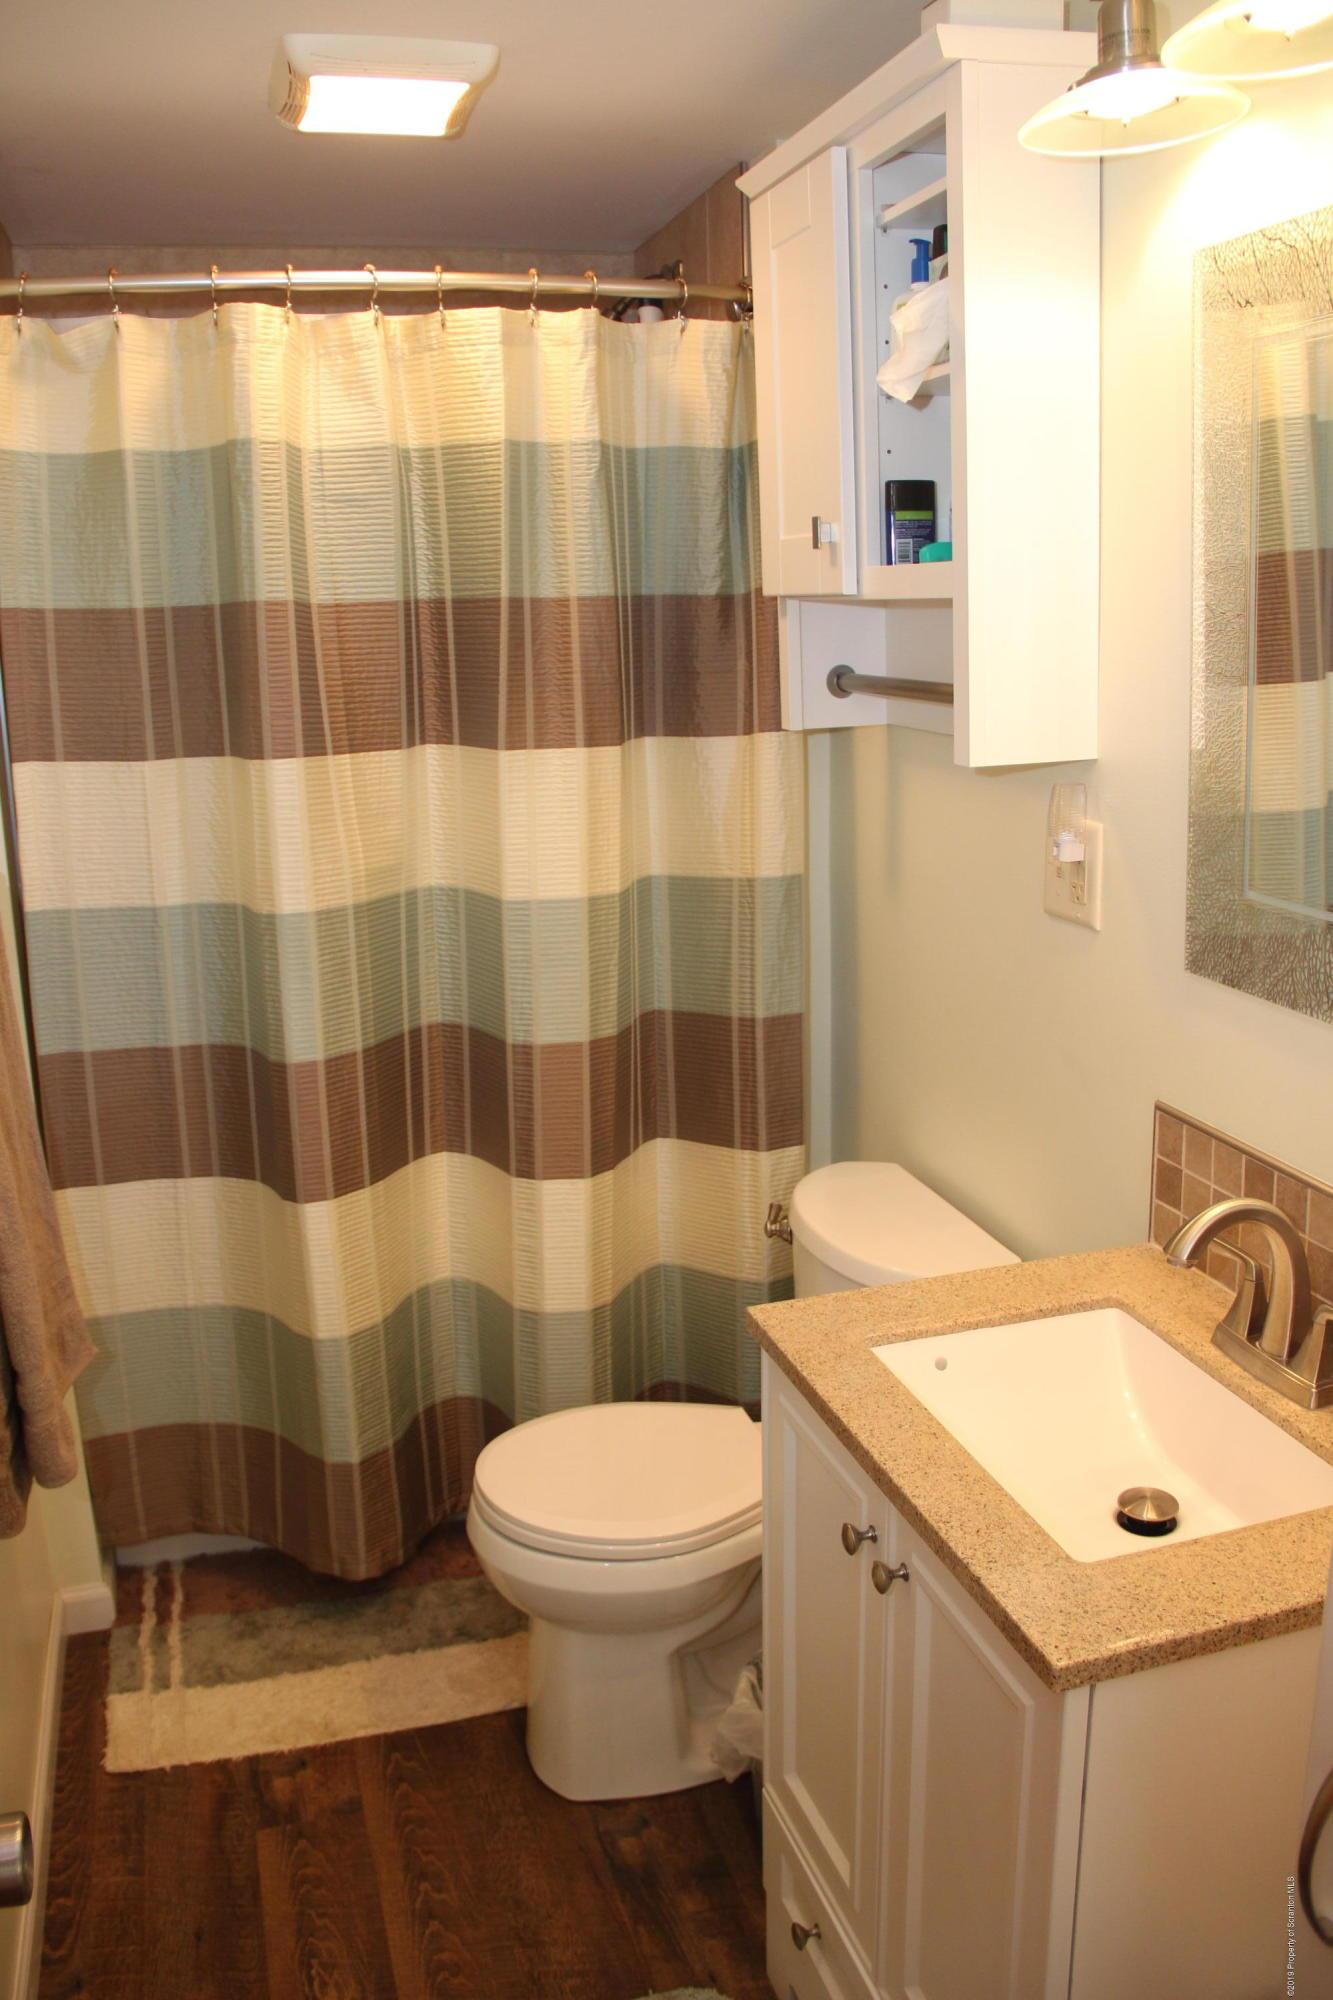 221 Merrifield Ave, Scranton, Pennsylvania 18504, 2 Bedrooms Bedrooms, 4 Rooms Rooms,1 BathroomBathrooms,Single Family,For Sale,Merrifield,19-5568